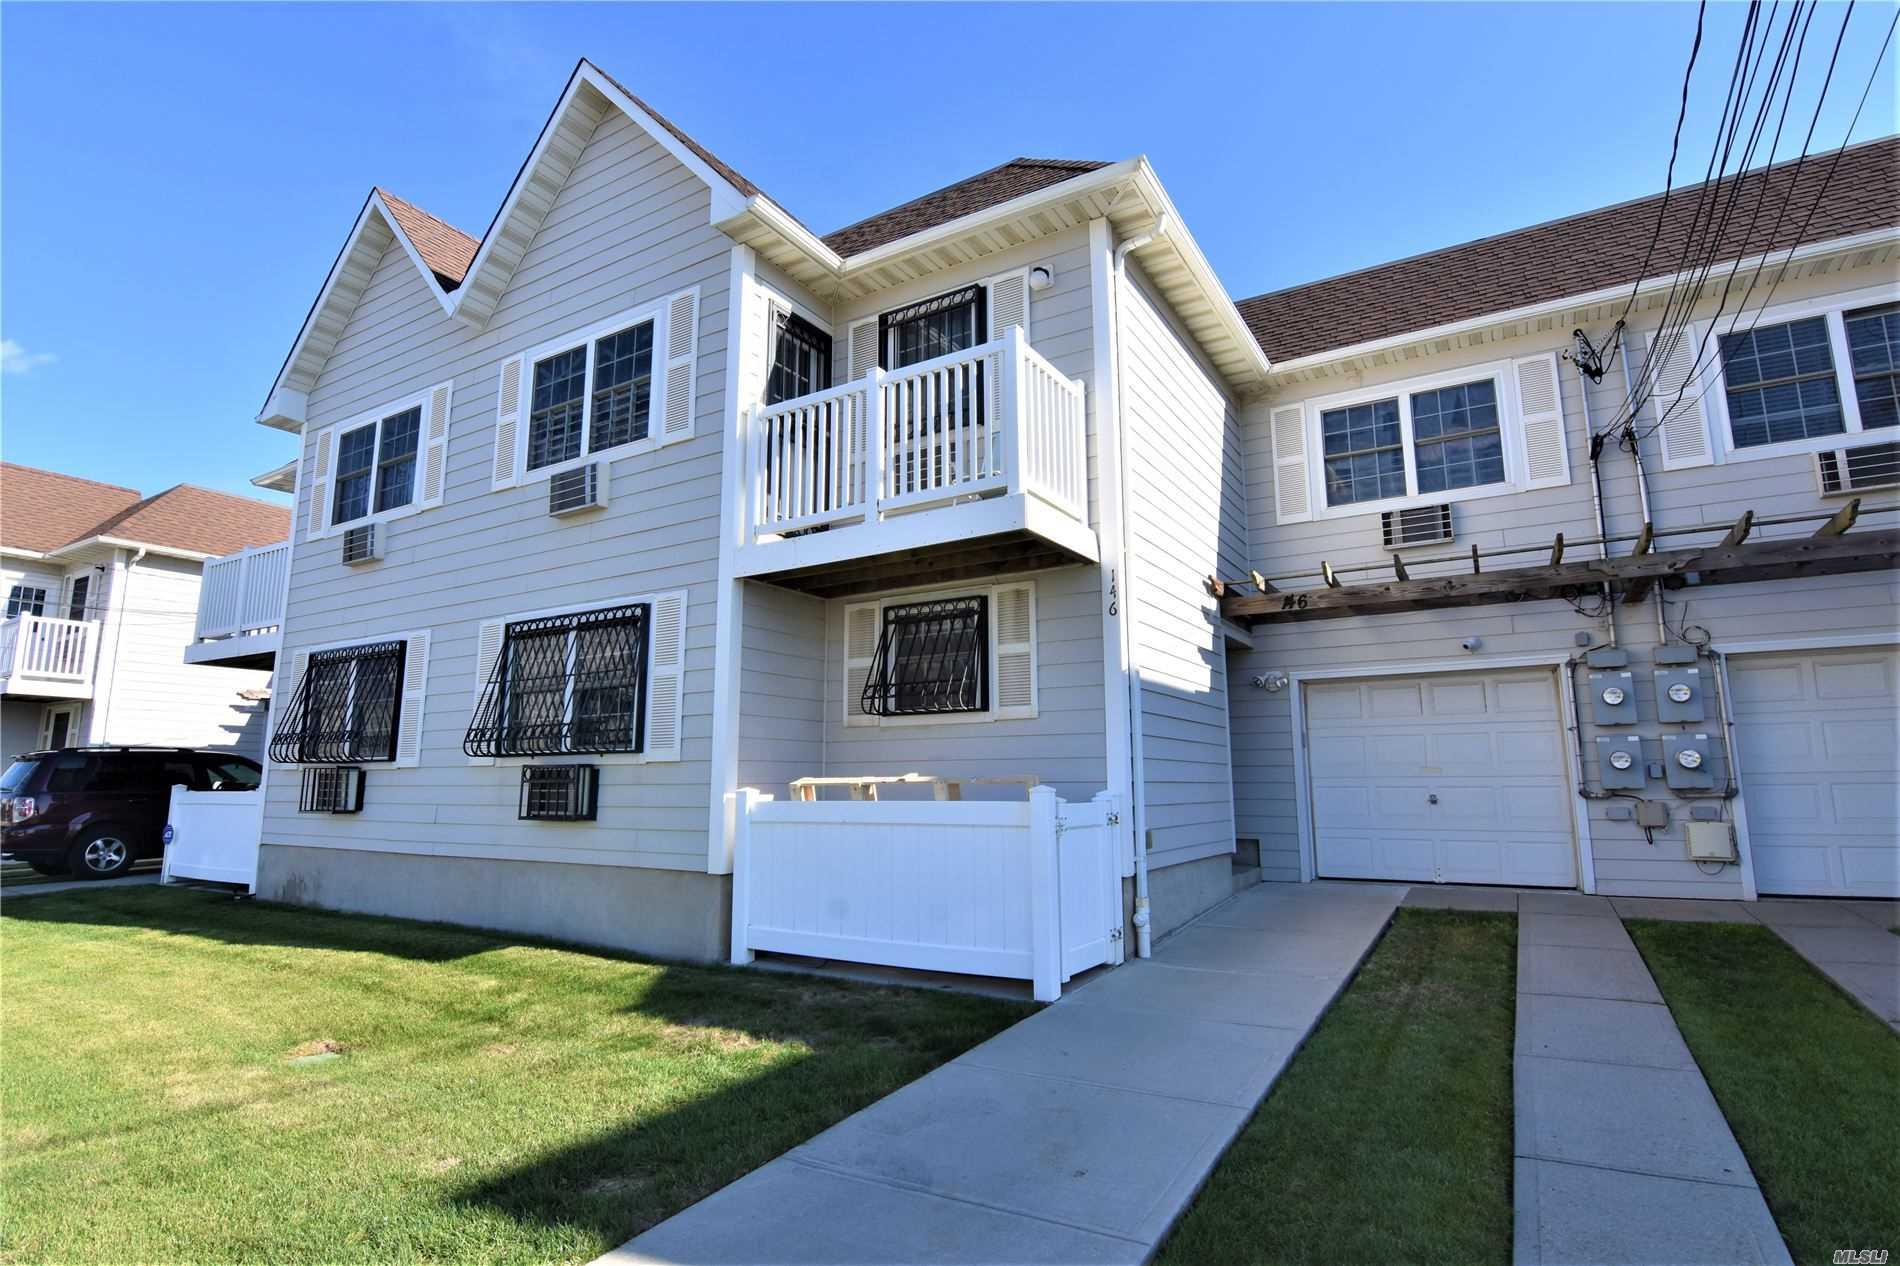 Property for sale at 146 Beach 62nd Street # 55, Arverne NY 11692, Arverne,  New York 11692